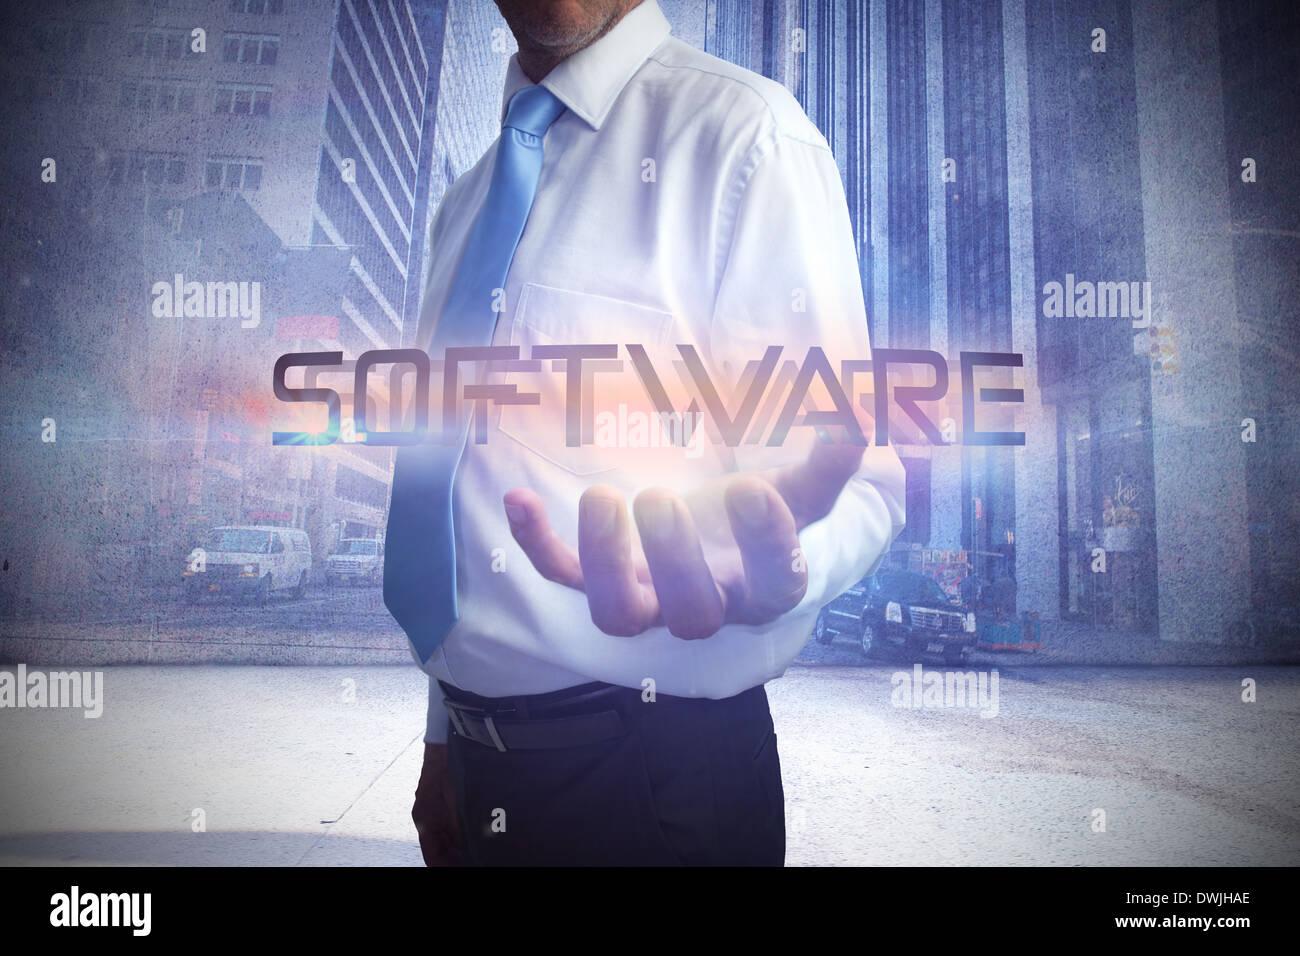 Le mot businessman presenting software Photo Stock